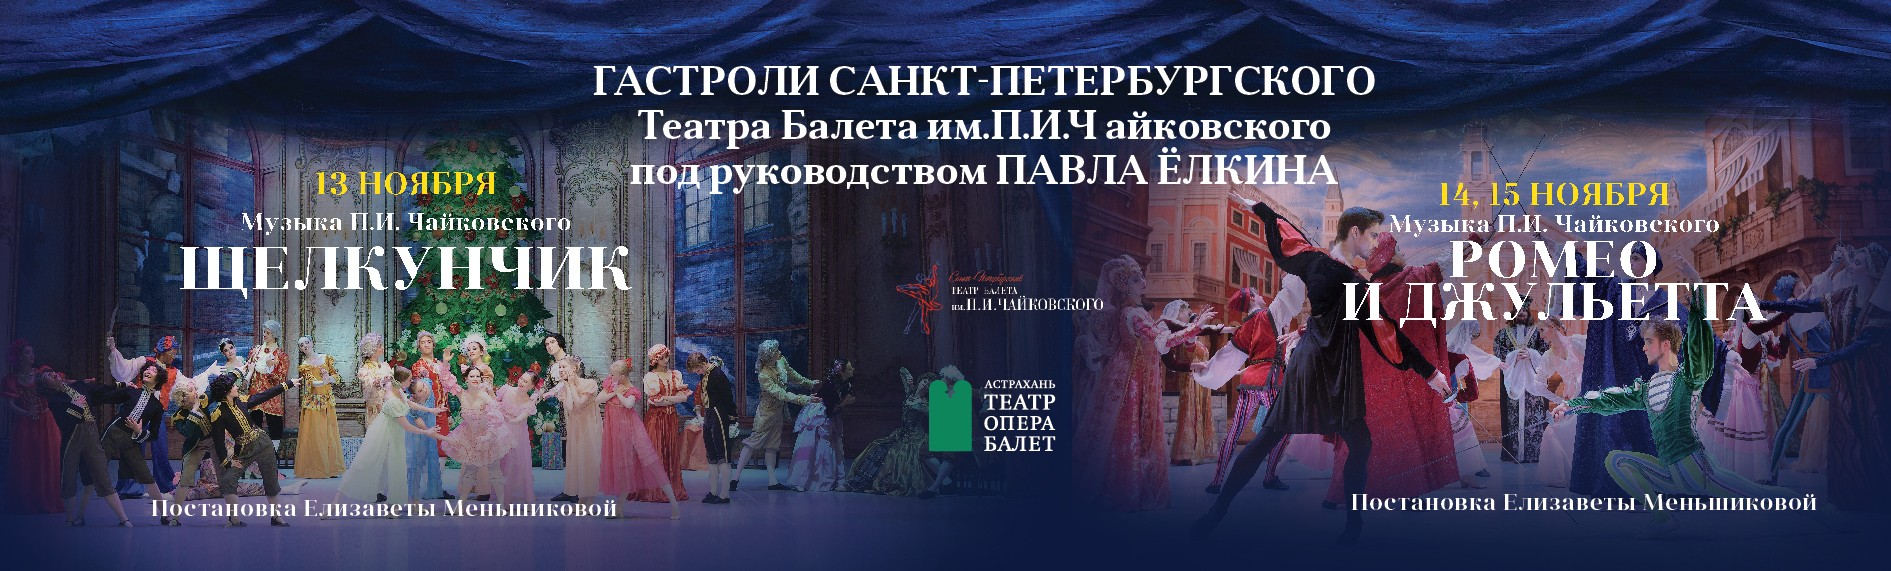 "Балет ""Щелкунчик"" Санкт-Петербургский театр балета им. П.И.Чайковского"